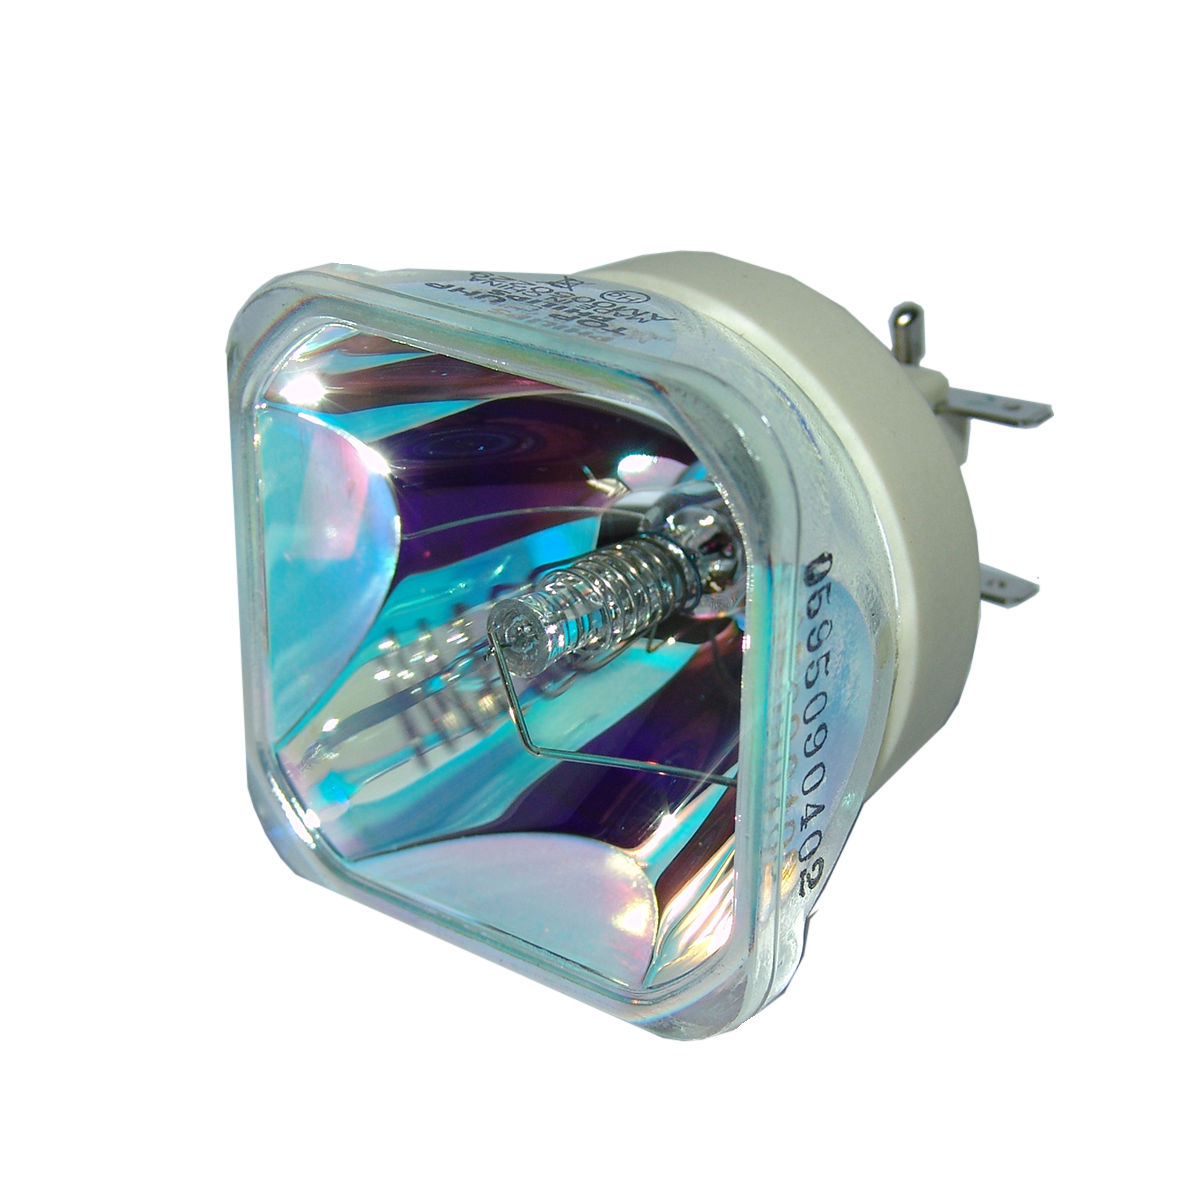 Compatible Bare Bulb ELPLP77 V13H010L77 for EPSON EB-4550 EB-4650 EB-4750W EB-4850WU EB-4950WU PowerLite 4650/4750W/4855WU/G5910